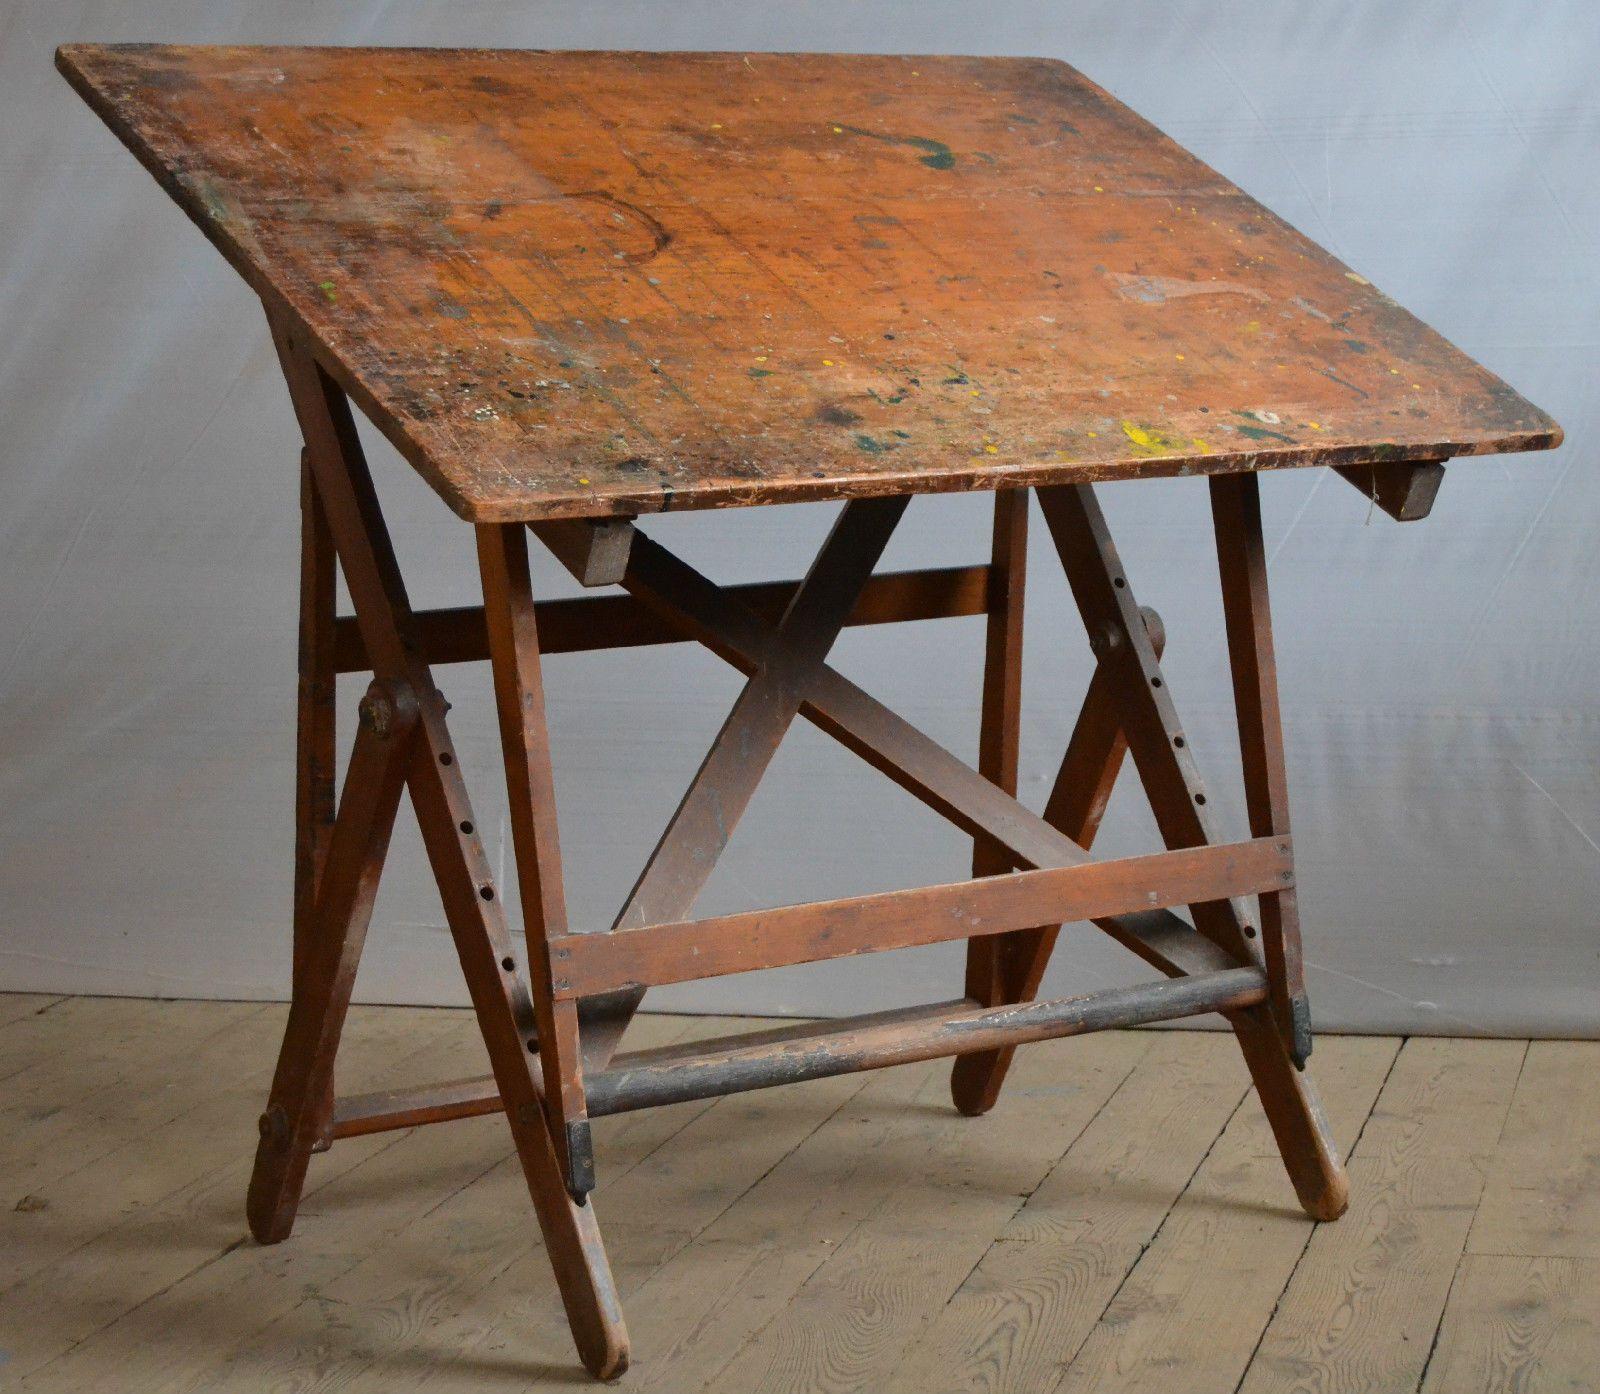 KEUFFEL  ESSER Drafting Table Antique Vintage Factory